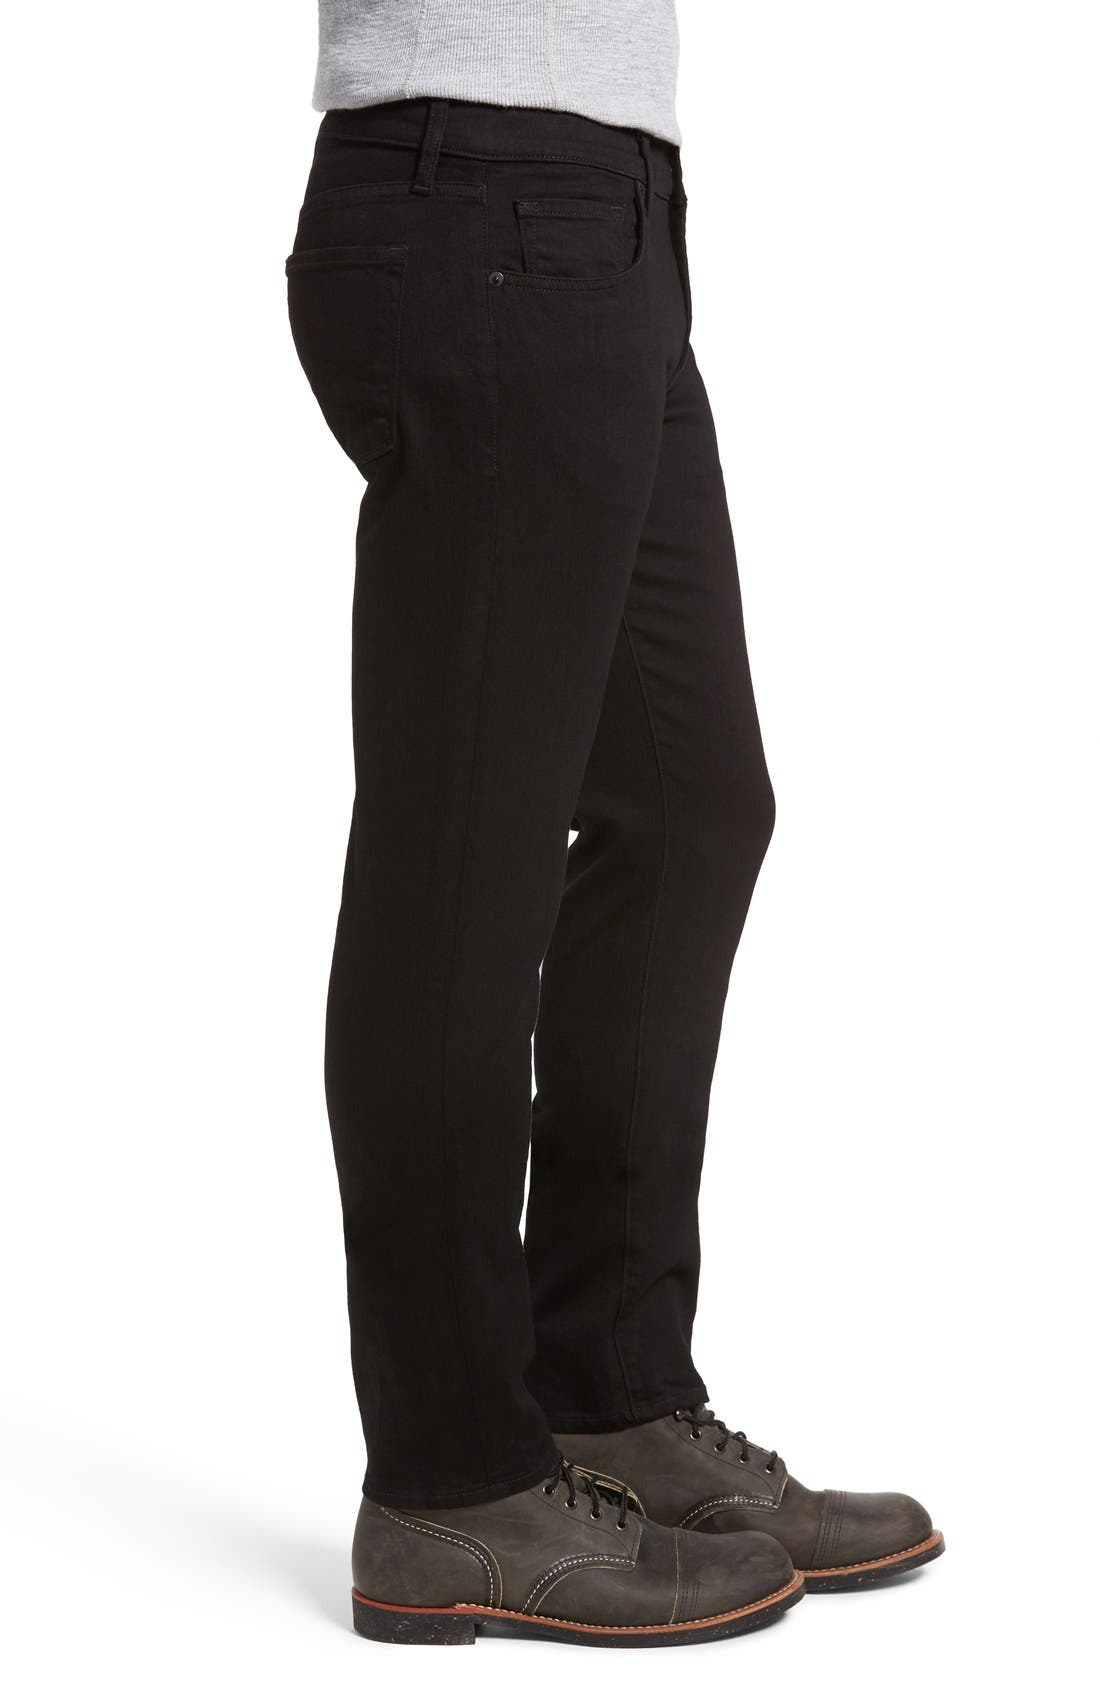 J BRAND, Tyler Slim Fit Jeans, Alternate thumbnail 5, color, TRIVOR BLACK